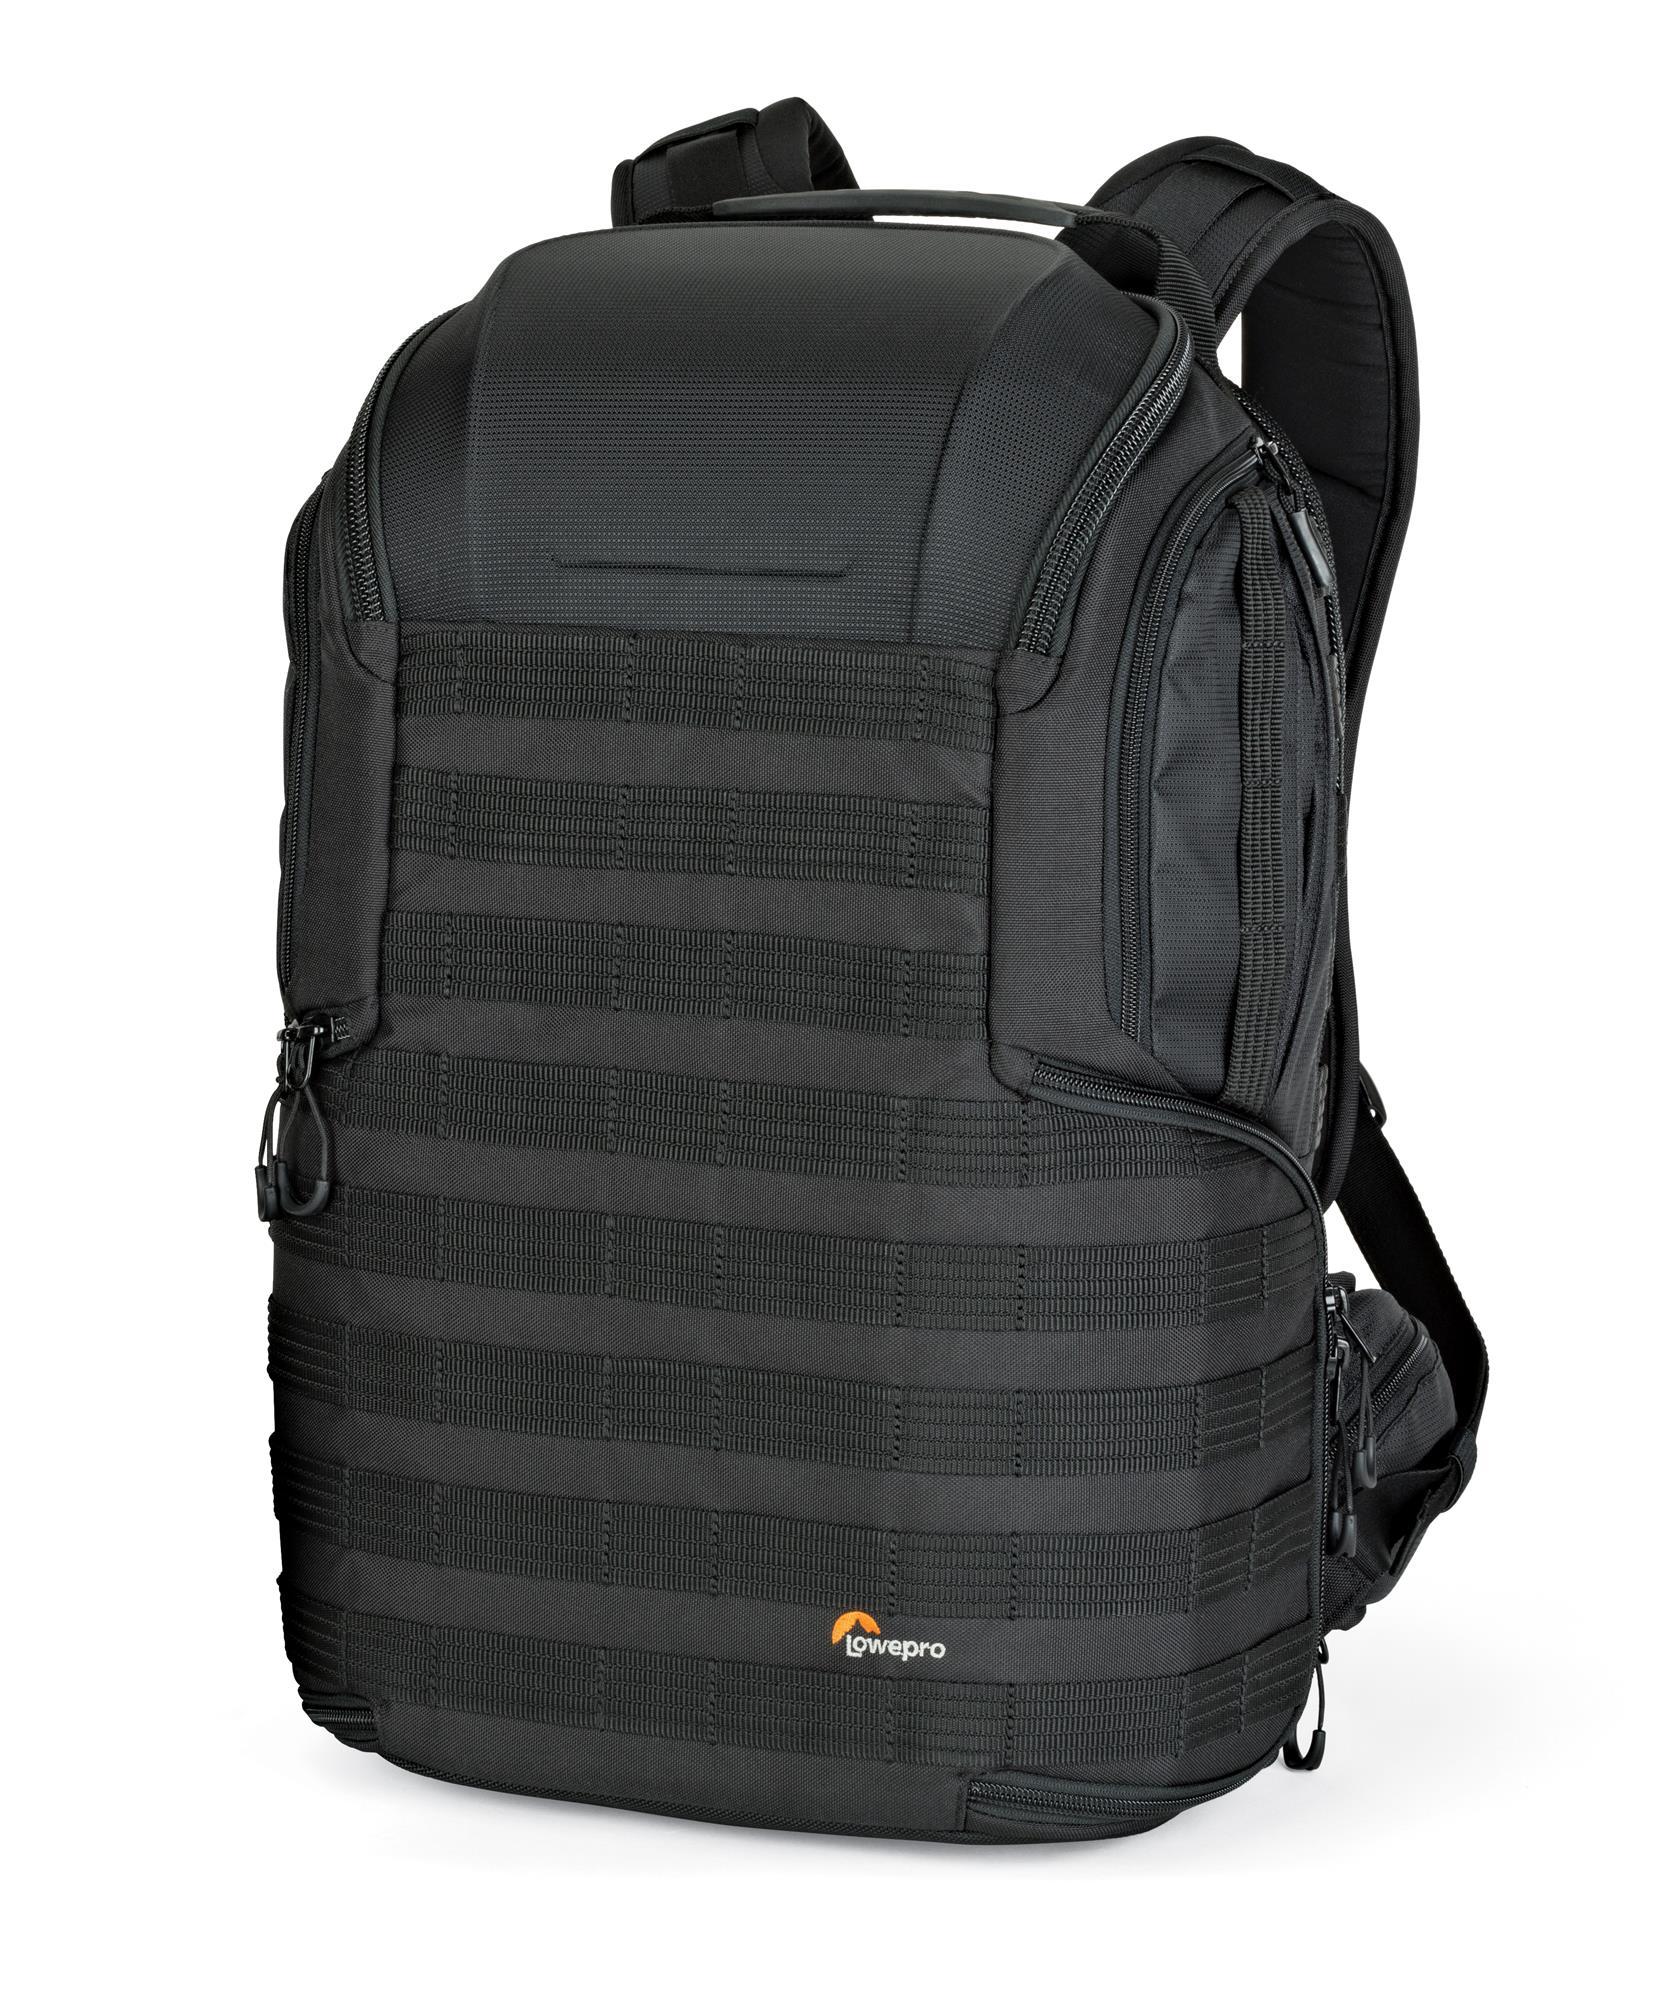 Lowepro ProTactic Rucksack 450 AW II